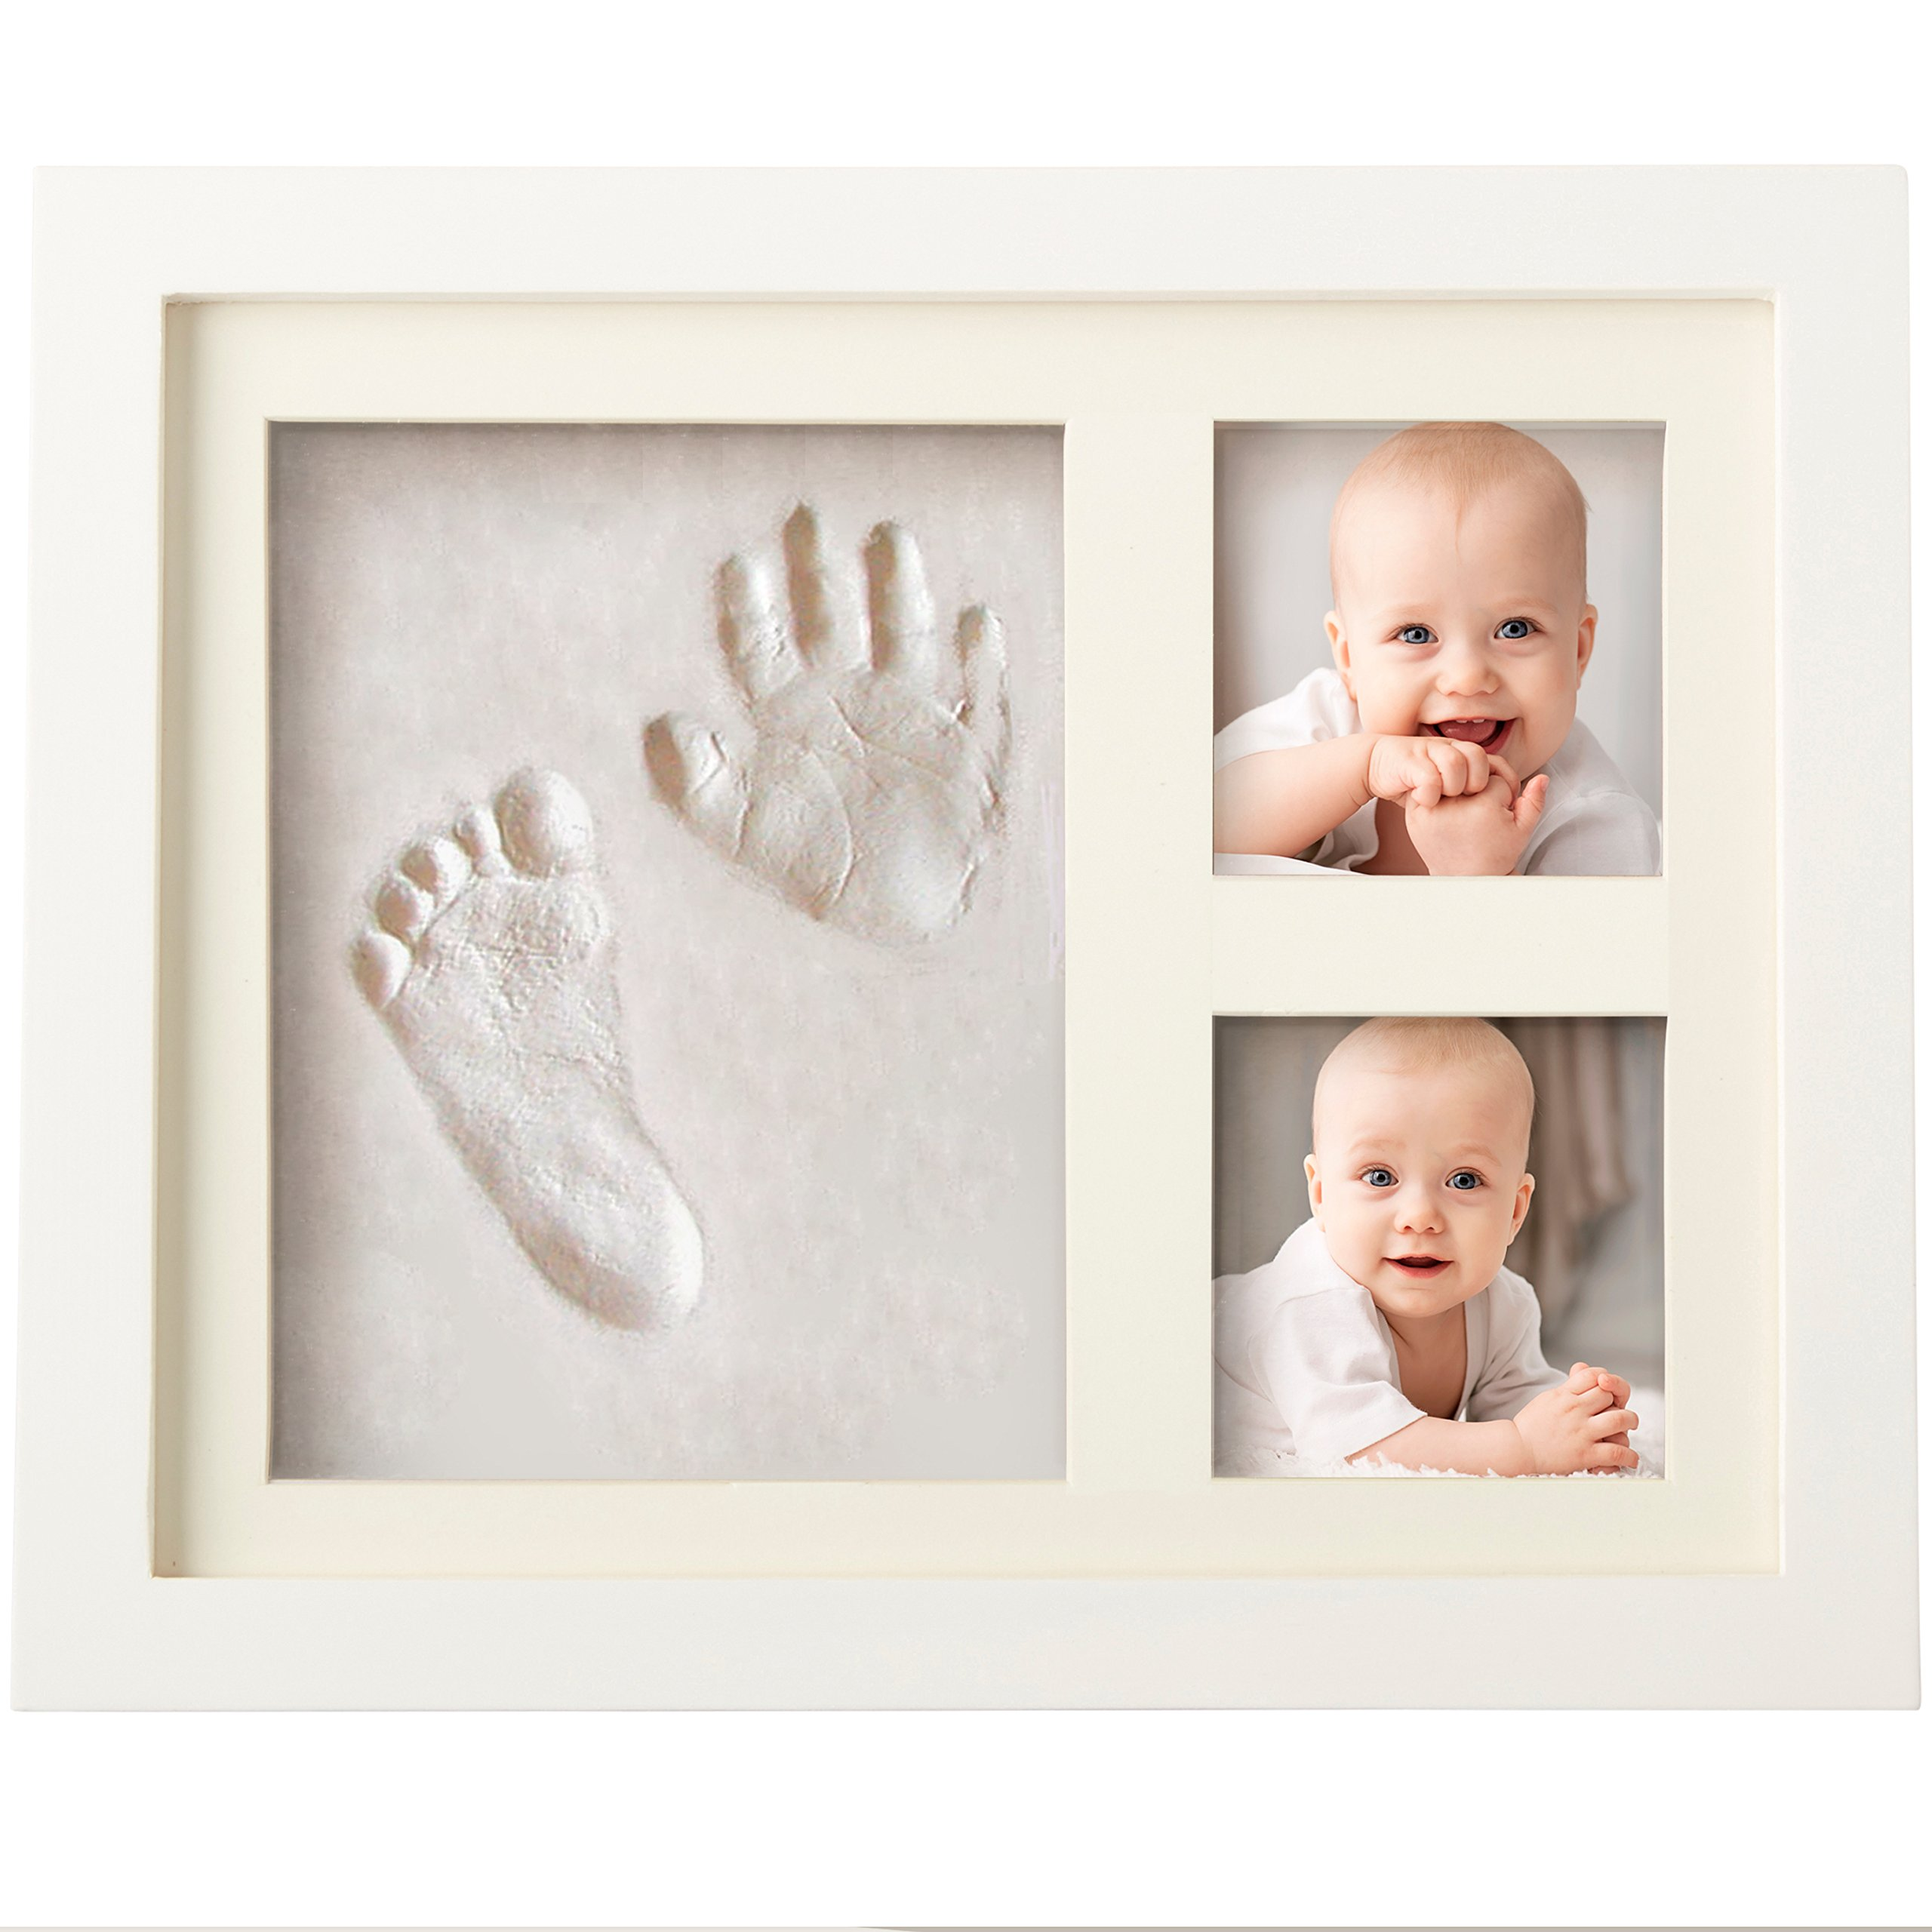 Bubzi Co 婴儿手印工具包和足印照片框架适合新生儿男女宝宝,婴儿照片相册适合淋浴登记,个性化婴儿礼物,纪念品盒装饰房壁托儿所装饰